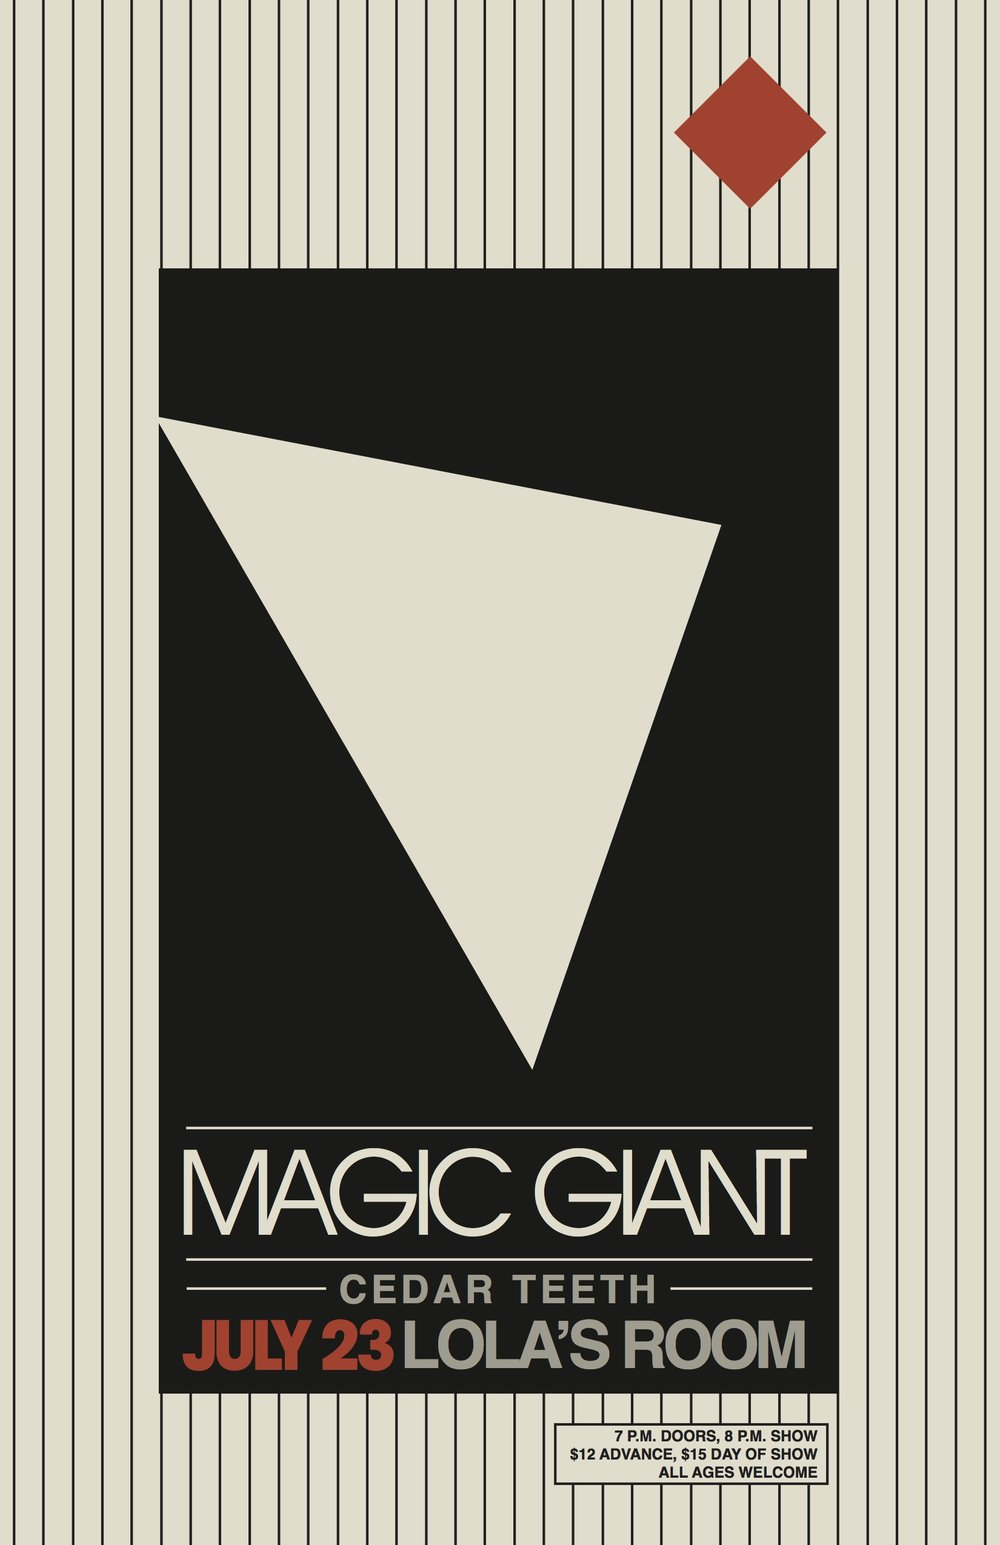 MagicGiantPoster.jpg